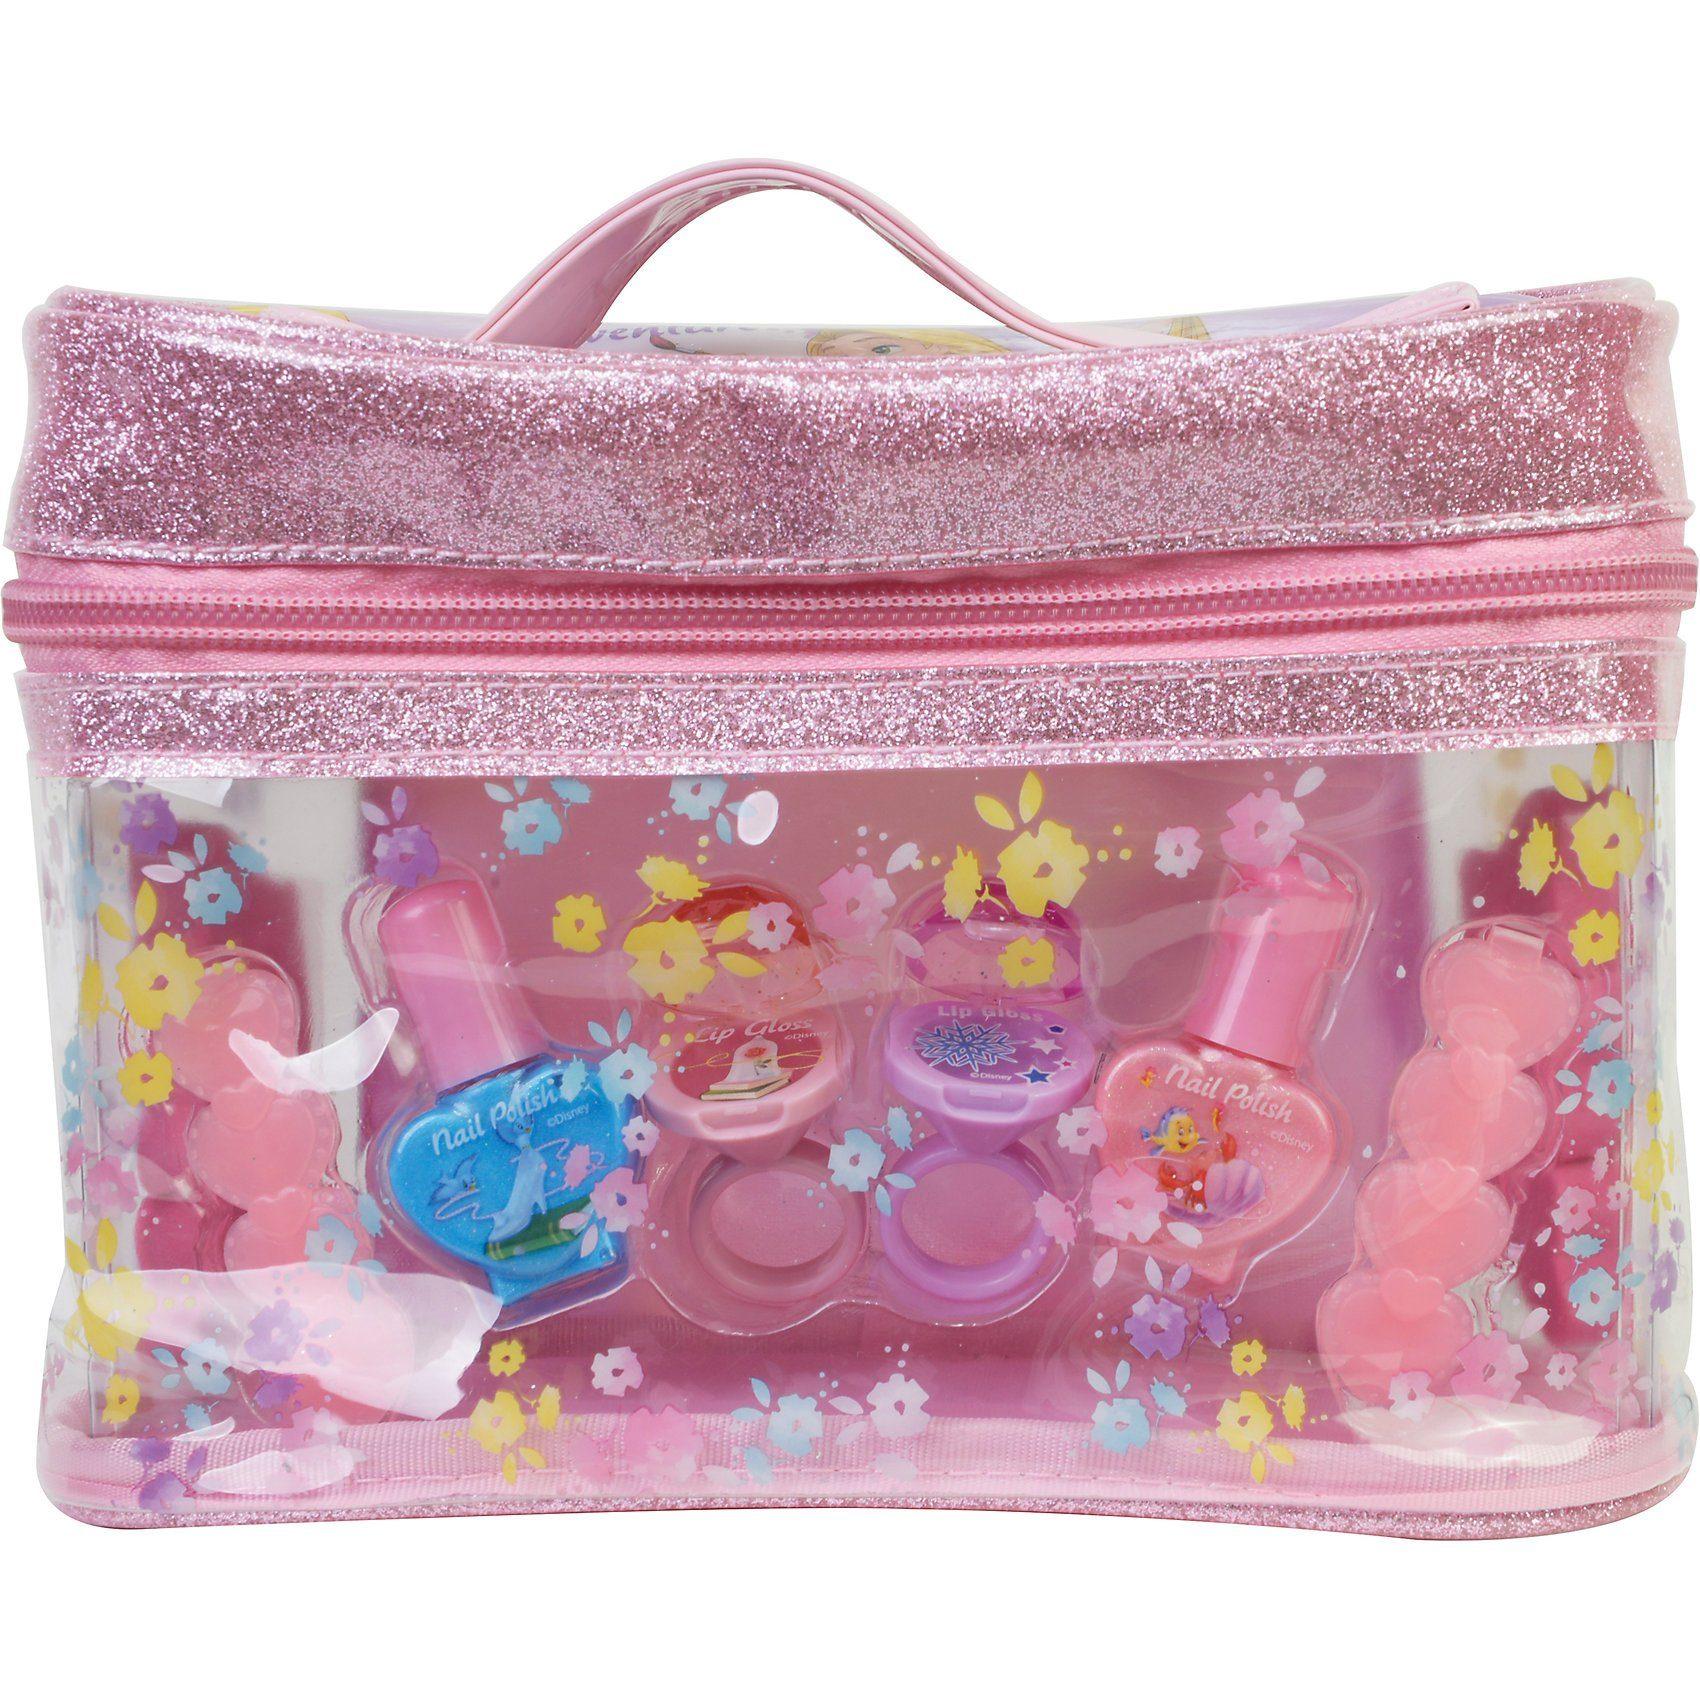 Empeak Disney Princess Makeup Tasche Shimmer & Shine